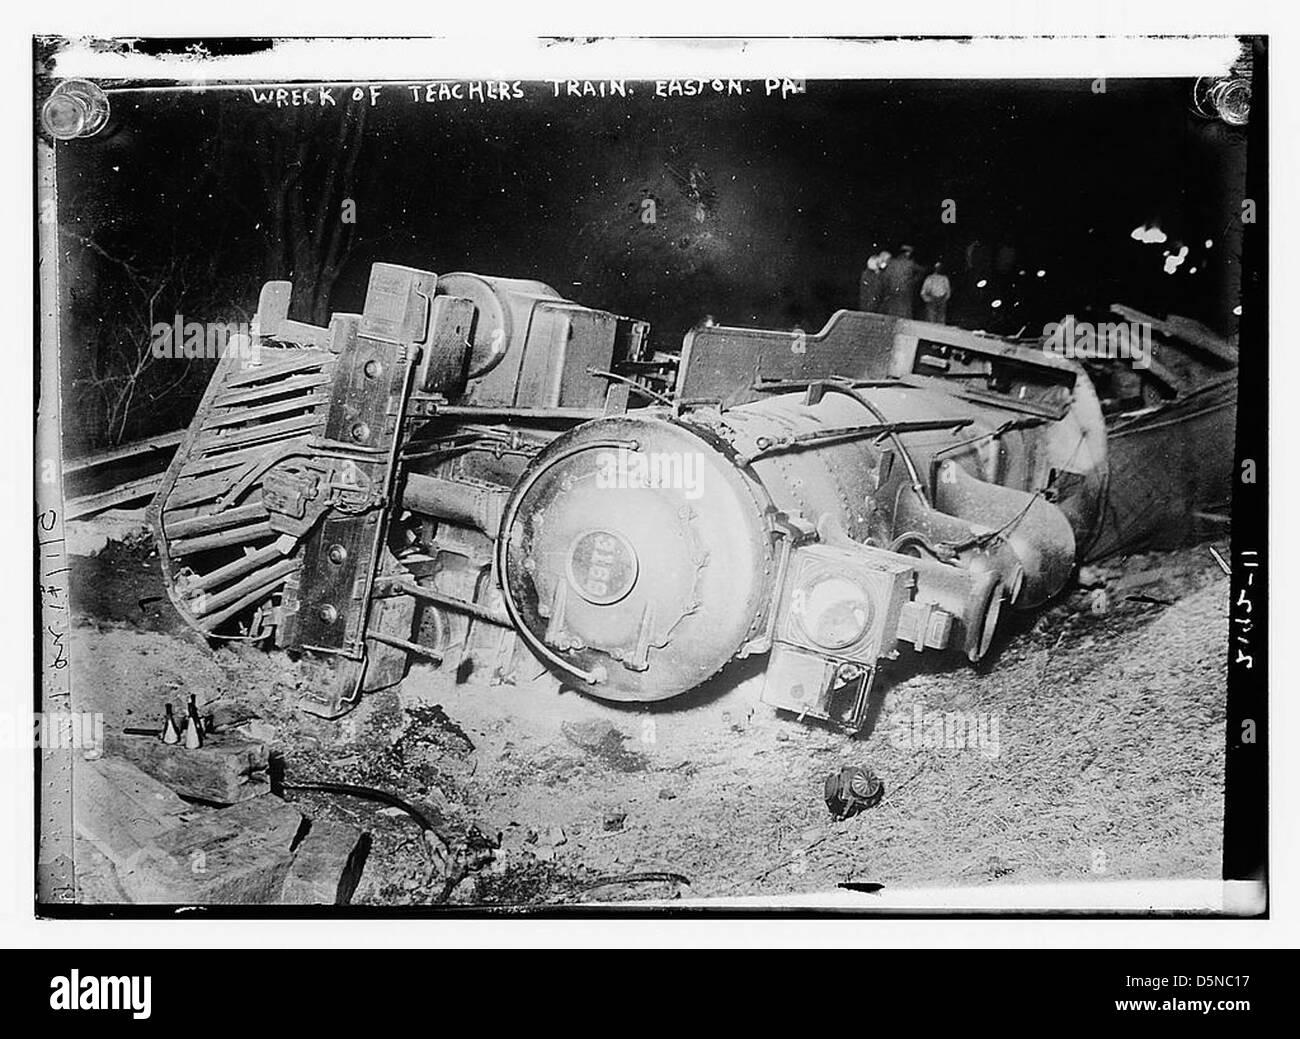 Wreck of teachers train (LOC) - Stock Image